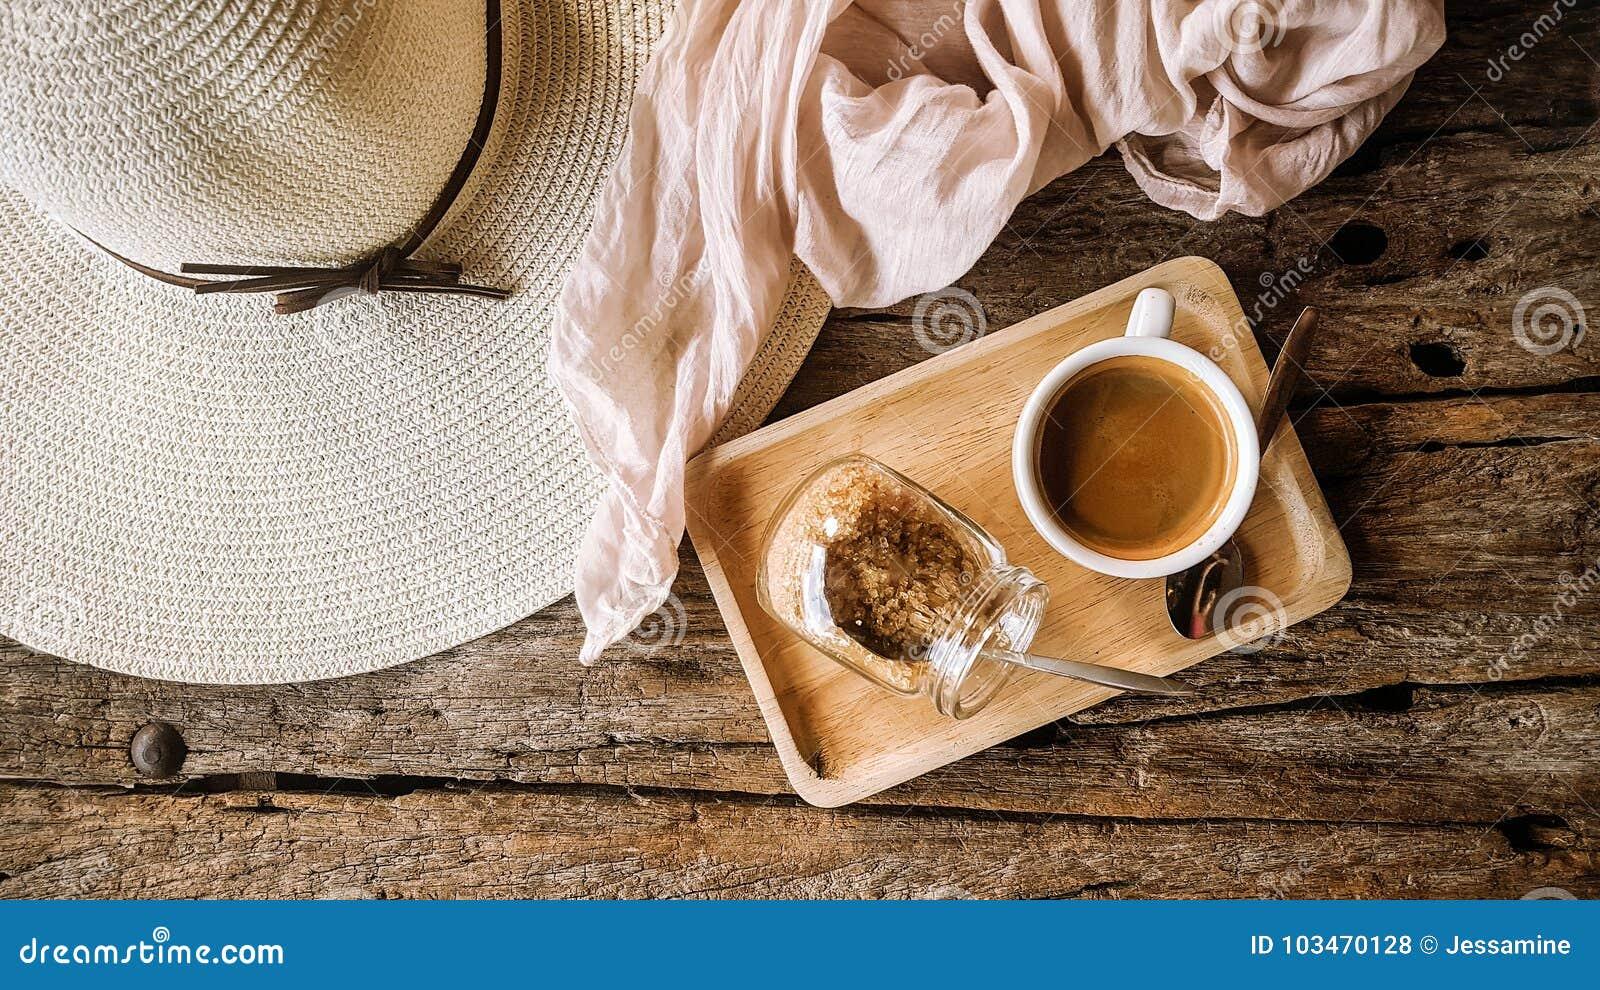 Black coffee with brown sugar